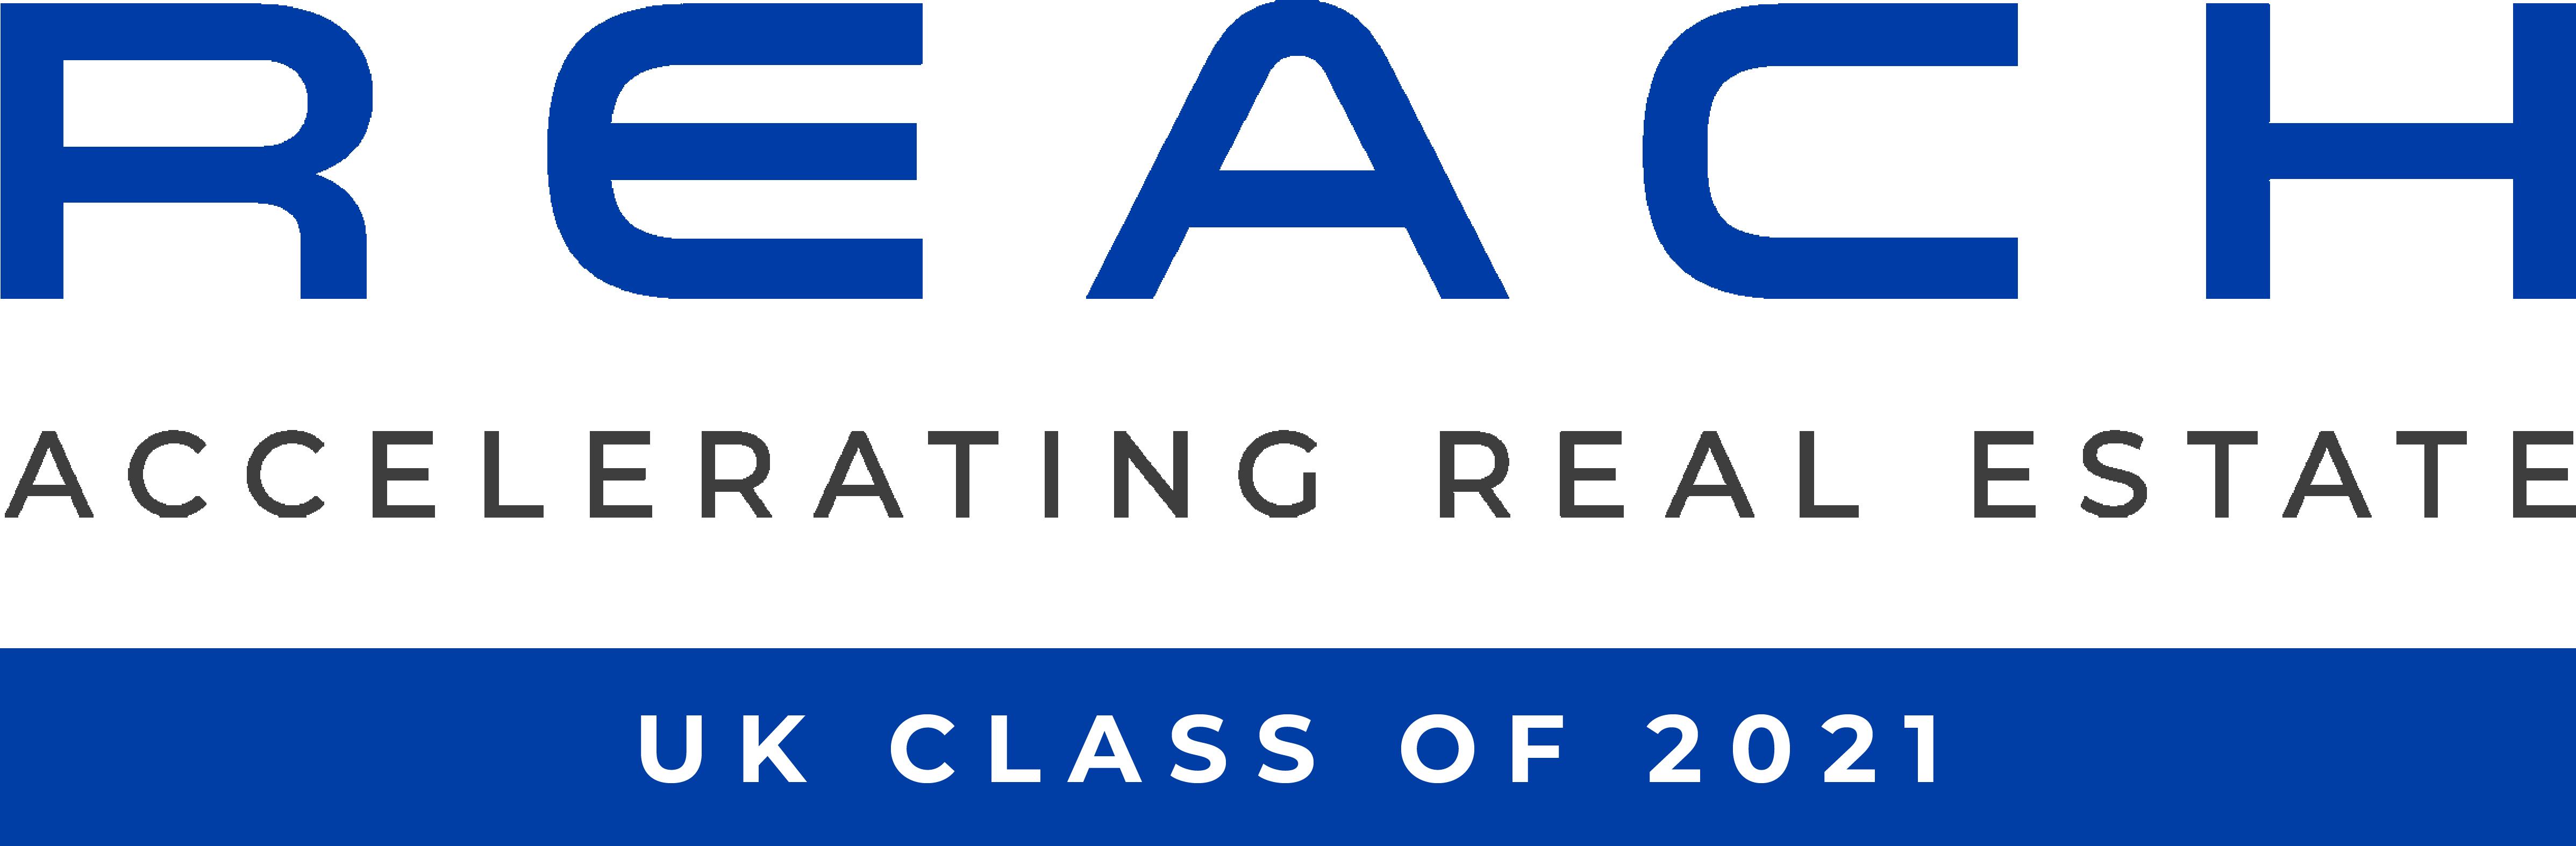 Second Century Ventures Announces Property Inspect as REACH UK Proptech Program Member